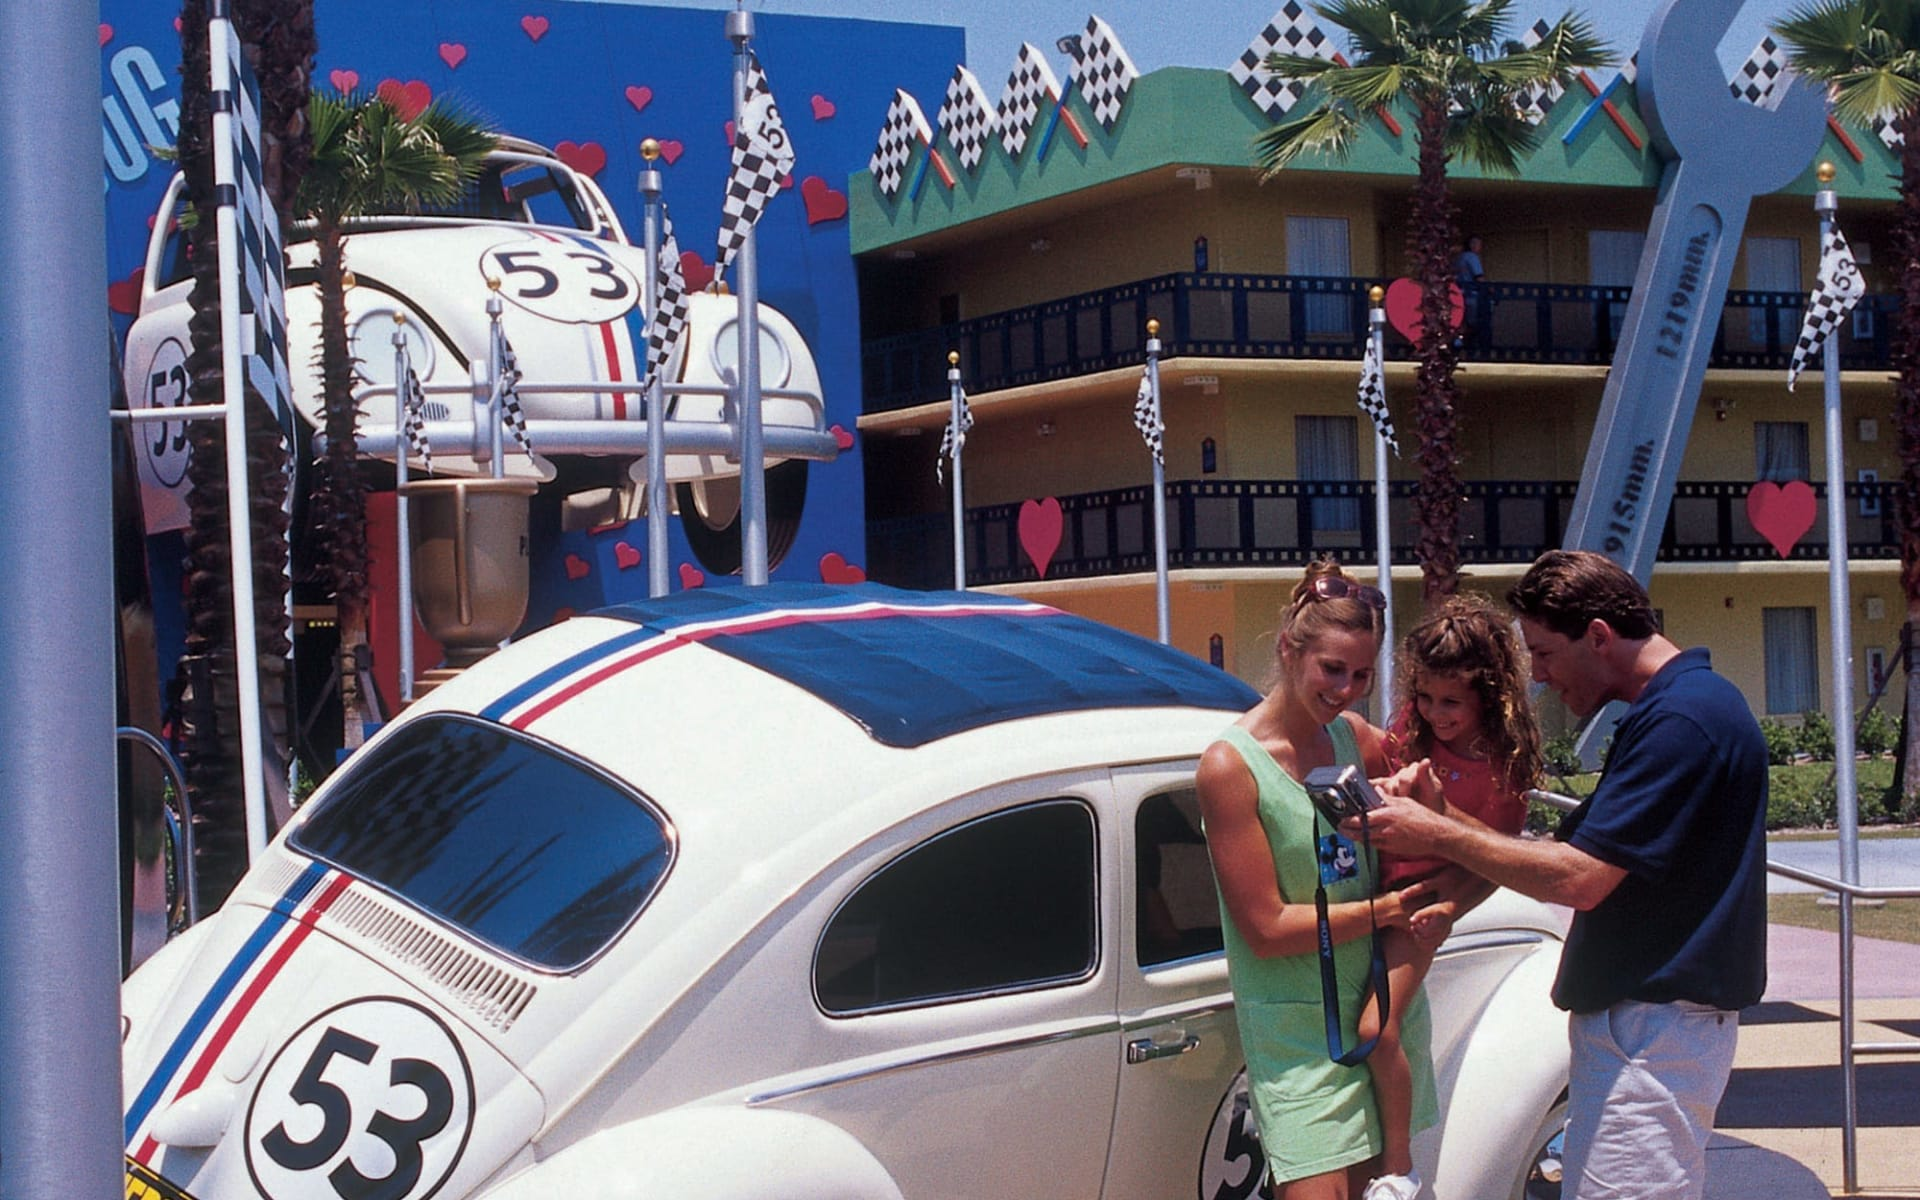 Disney's All Star Movies Resort in Lake Buena Vista: All Star Movies_Disney_Orlando - Cars